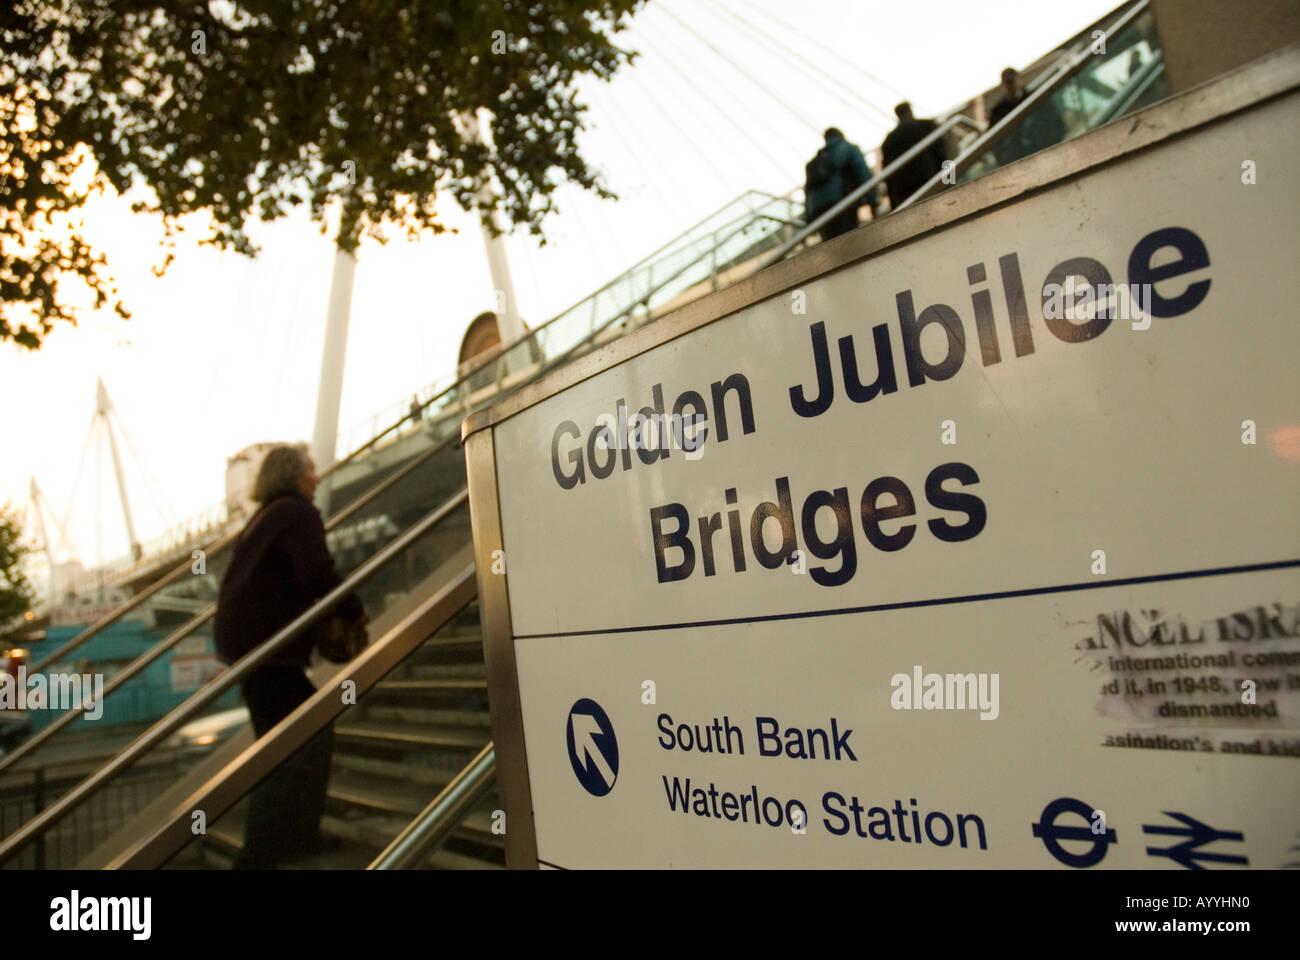 Golden Jubilee Bridges street sign London England - Stock Image